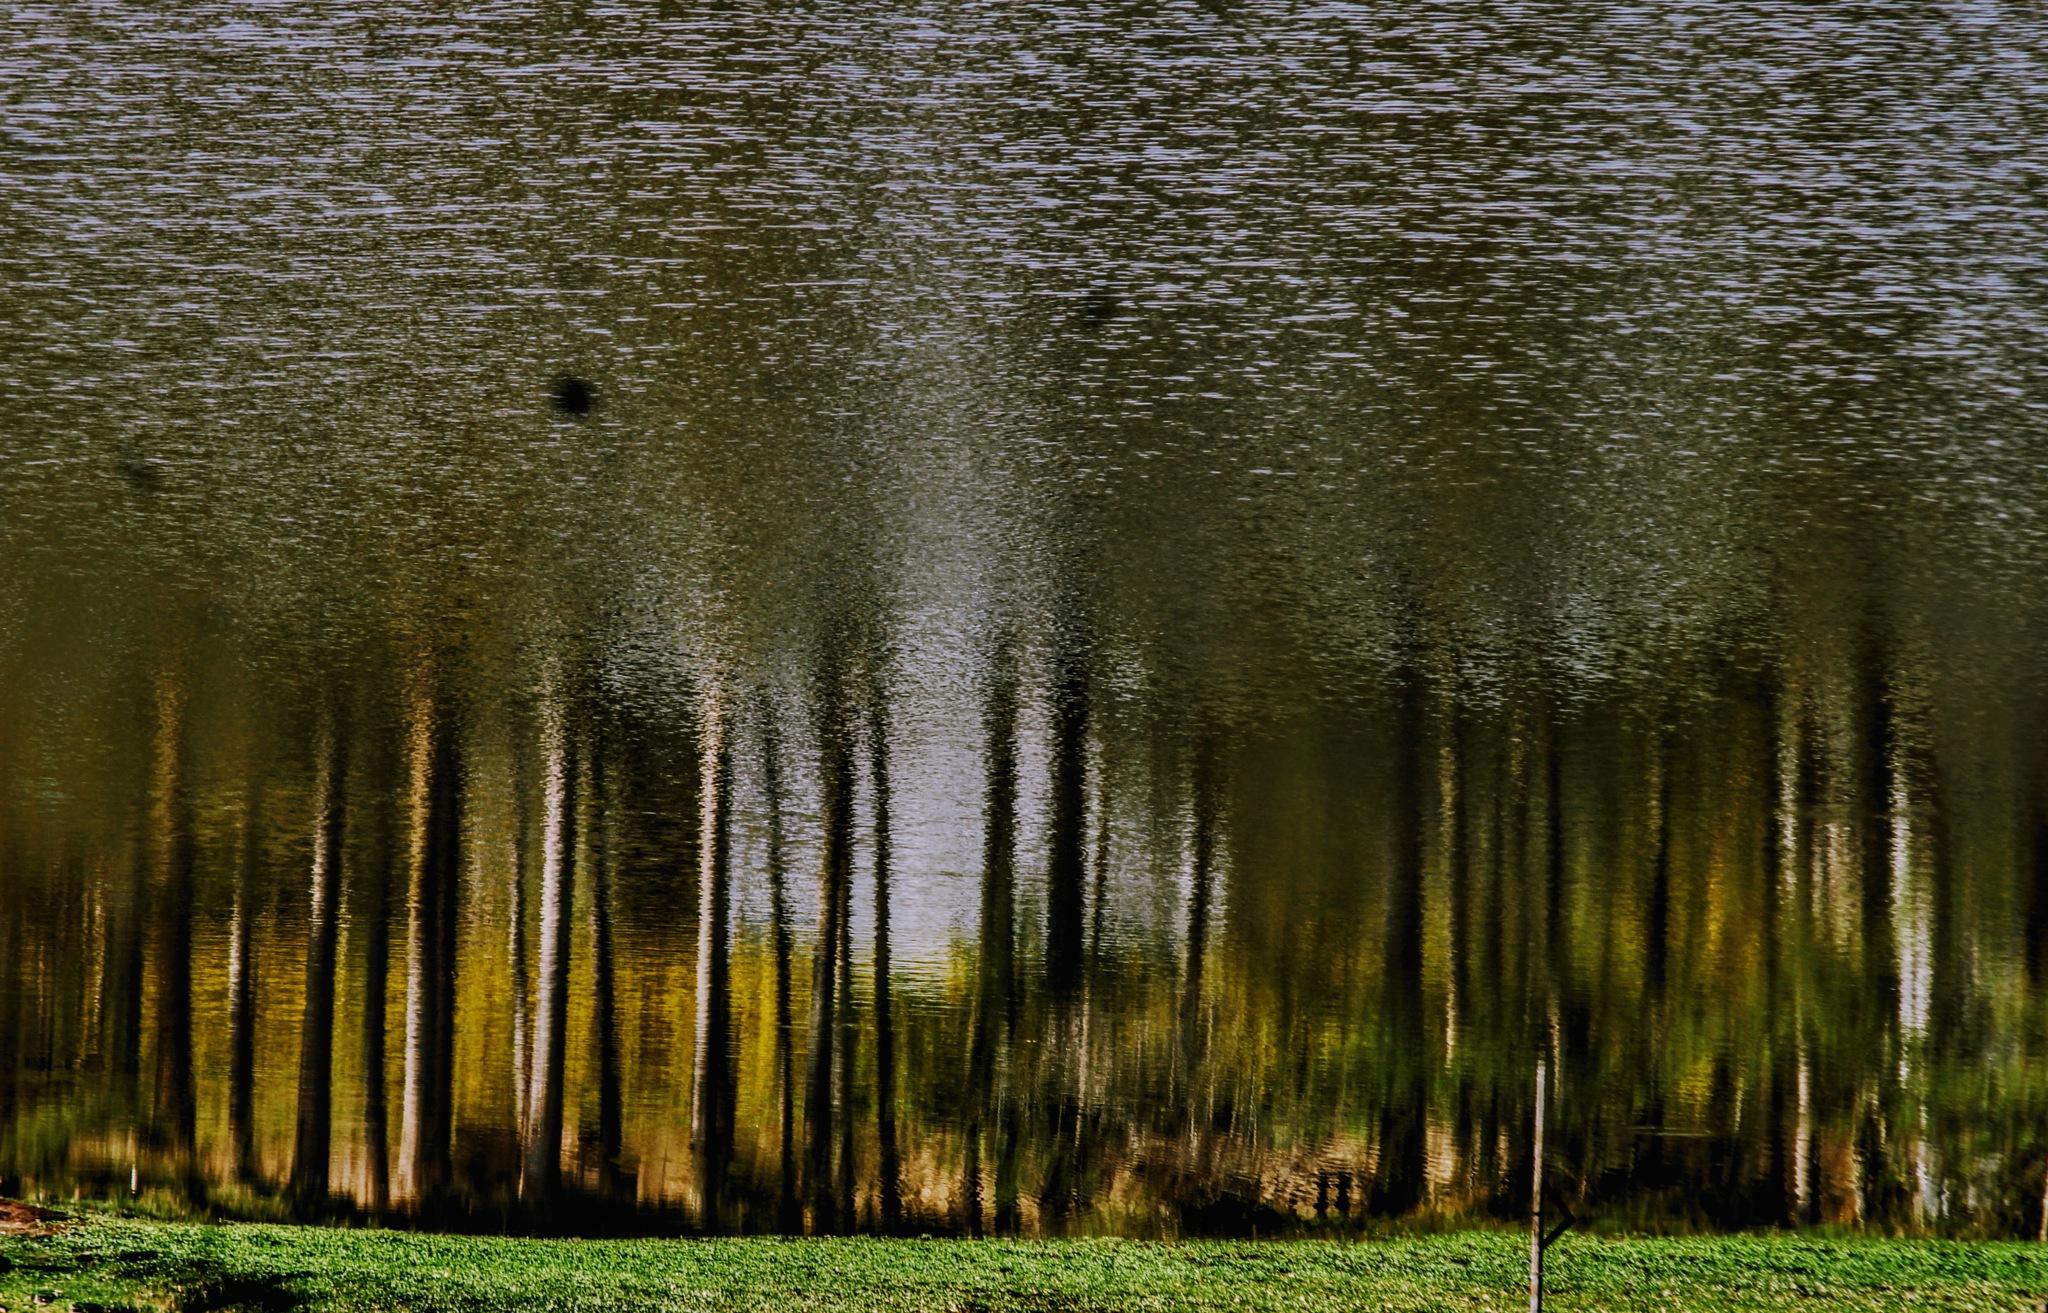 Untitled by guto monteiro